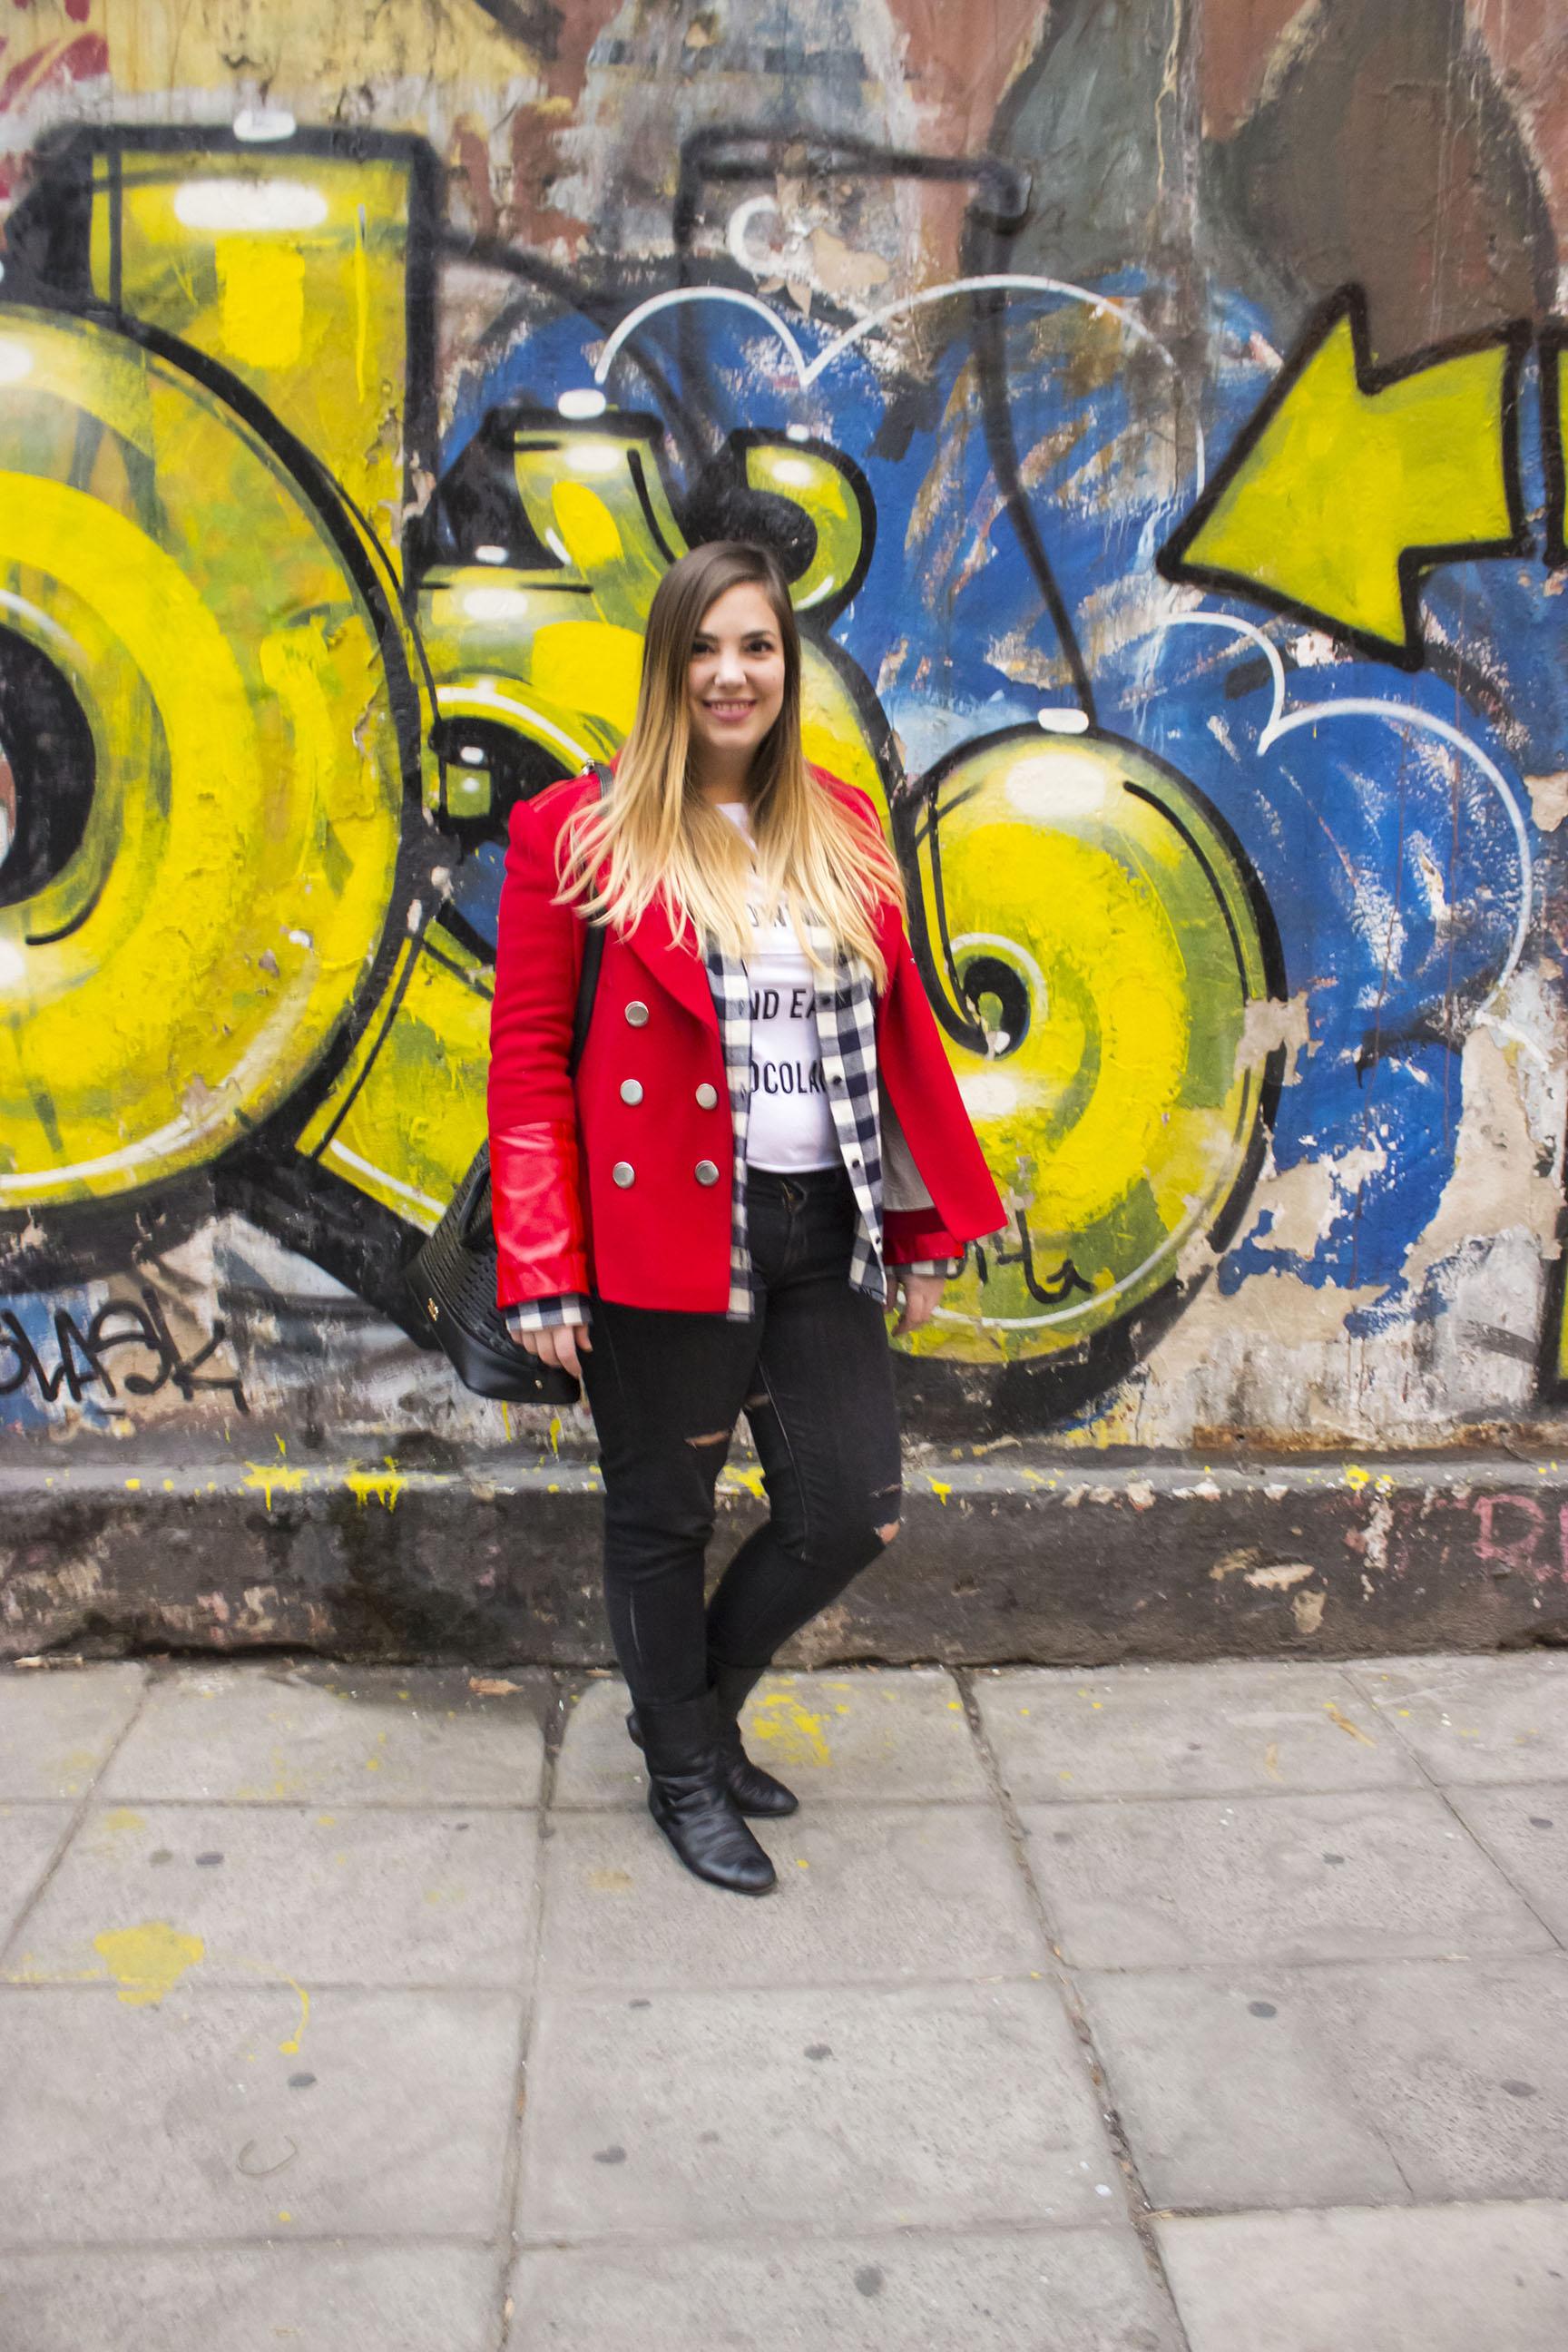 Get the look: Remera, Muaa!. Tapado, Jazmin Chebar. Jeans vintage. Botas, H&M. Reloj, Michael Kors. Cartera, XL Extra Large.